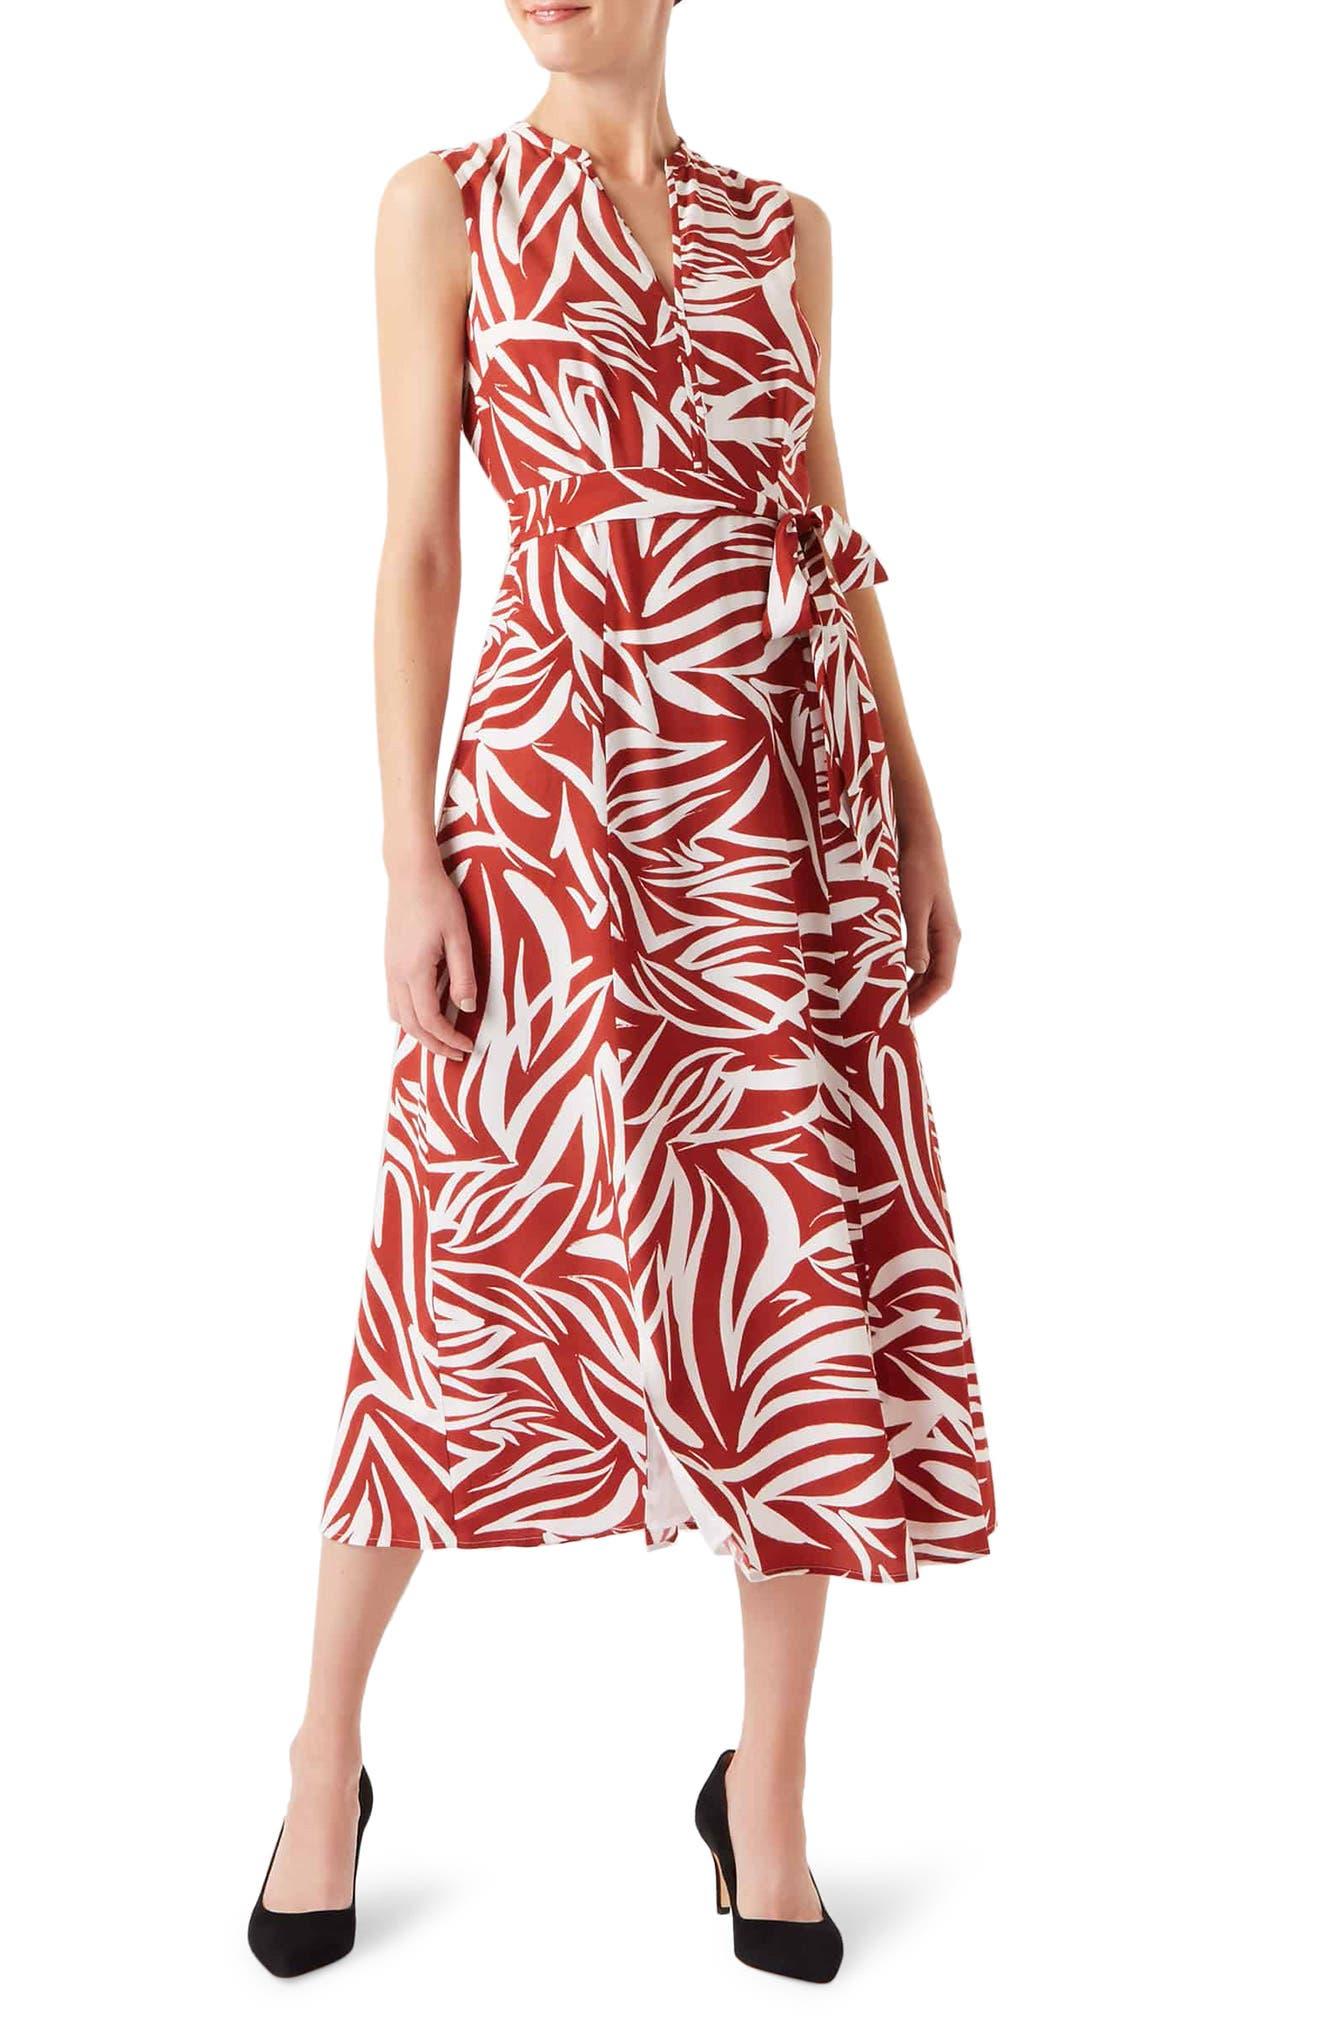 Image of Hobbs Shelly Print Sleeveless Dress